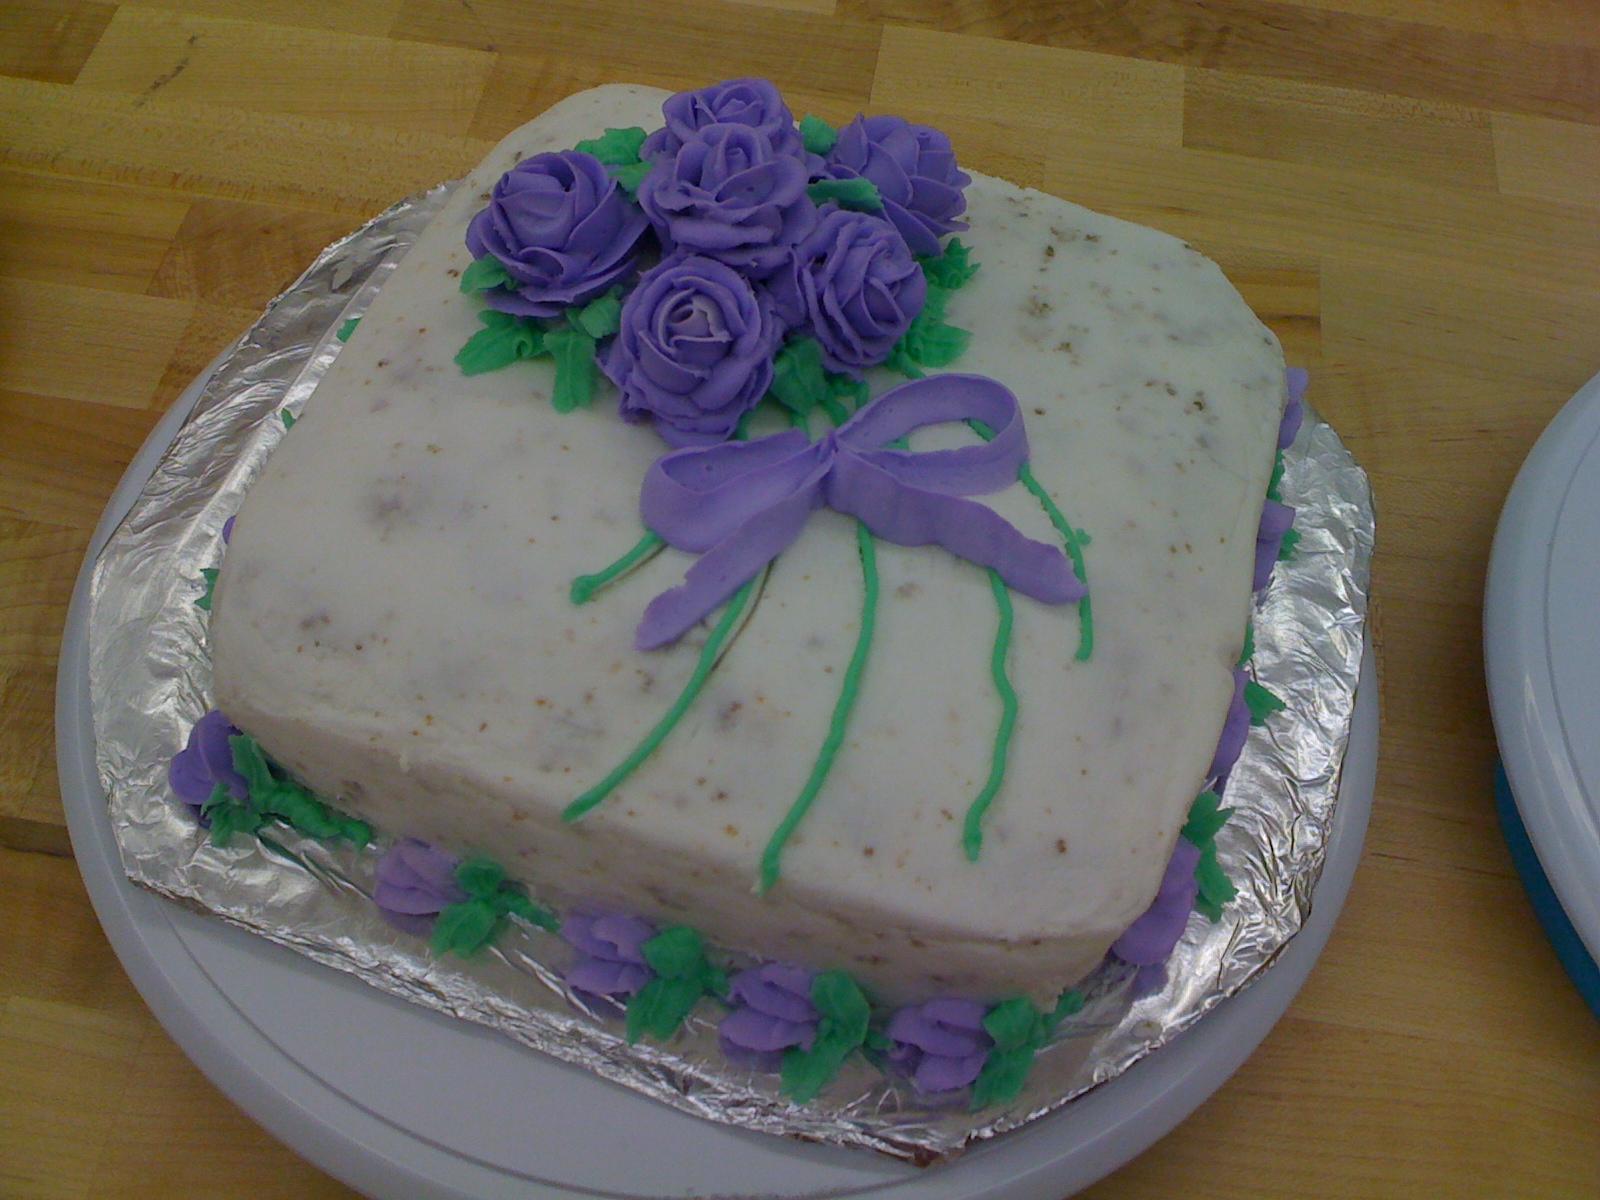 Cake Decorating Class Ryedale